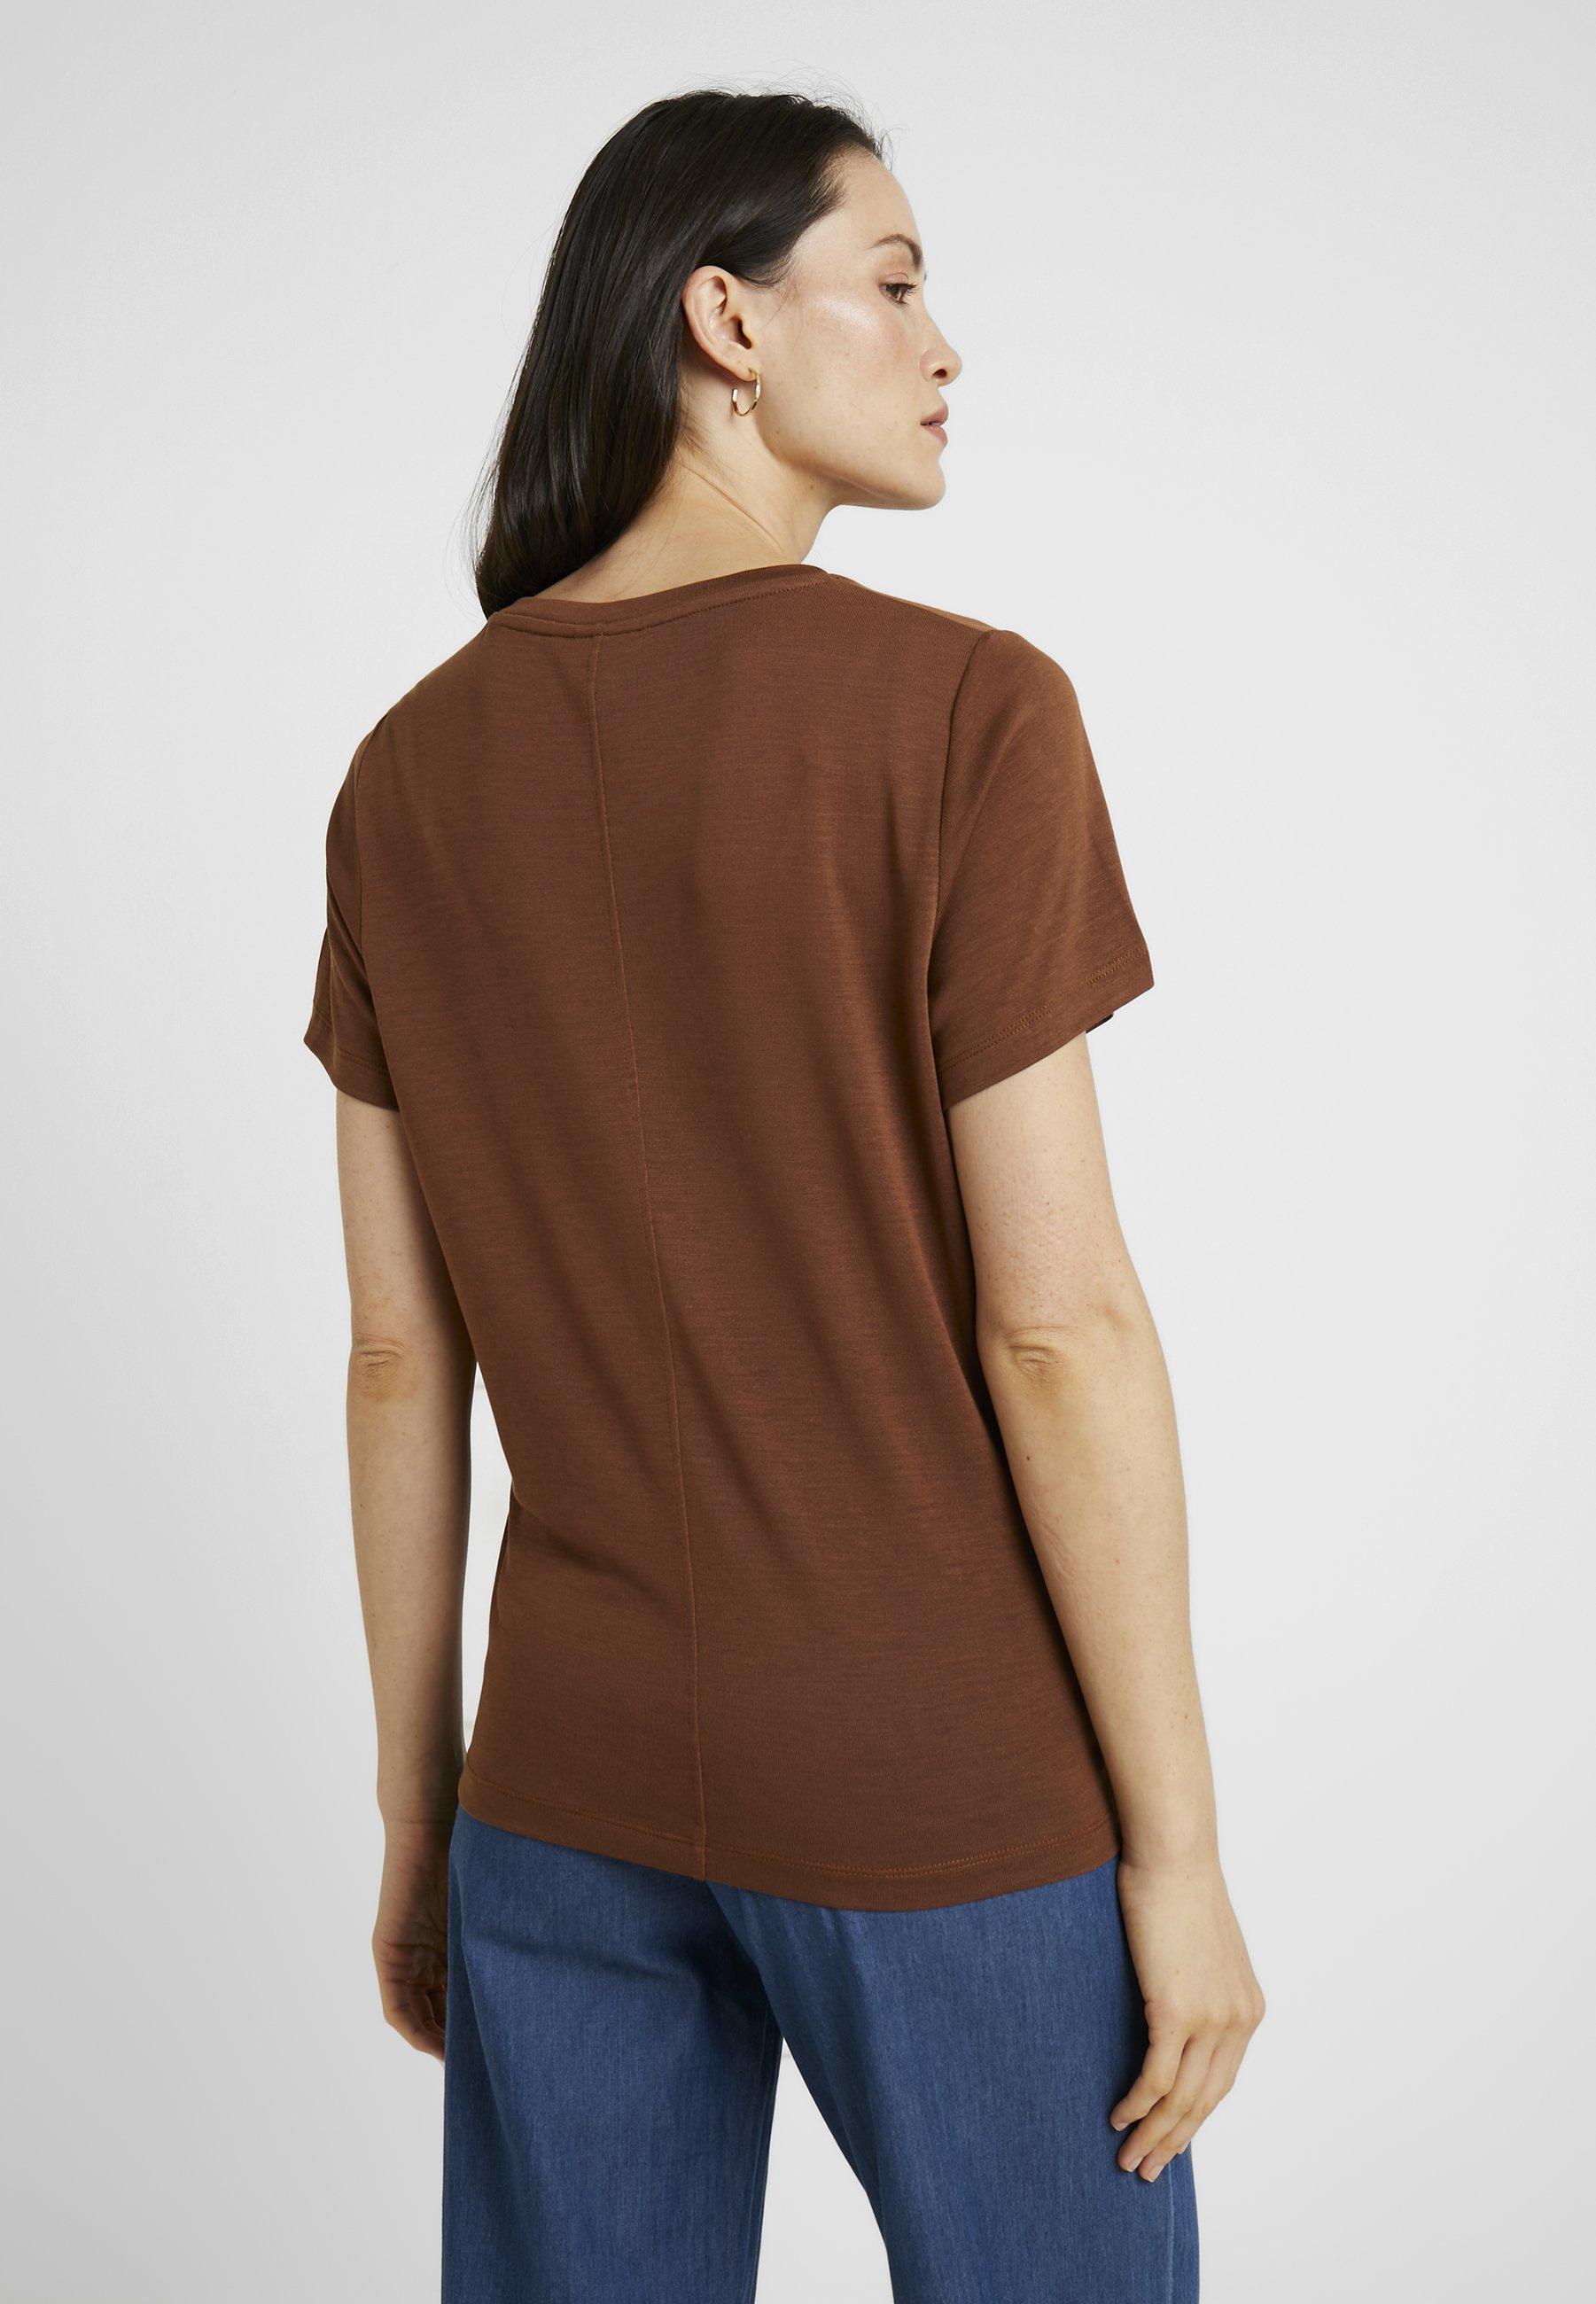 Basique Cinnamon V NeckT shirt Boob 7gby6f